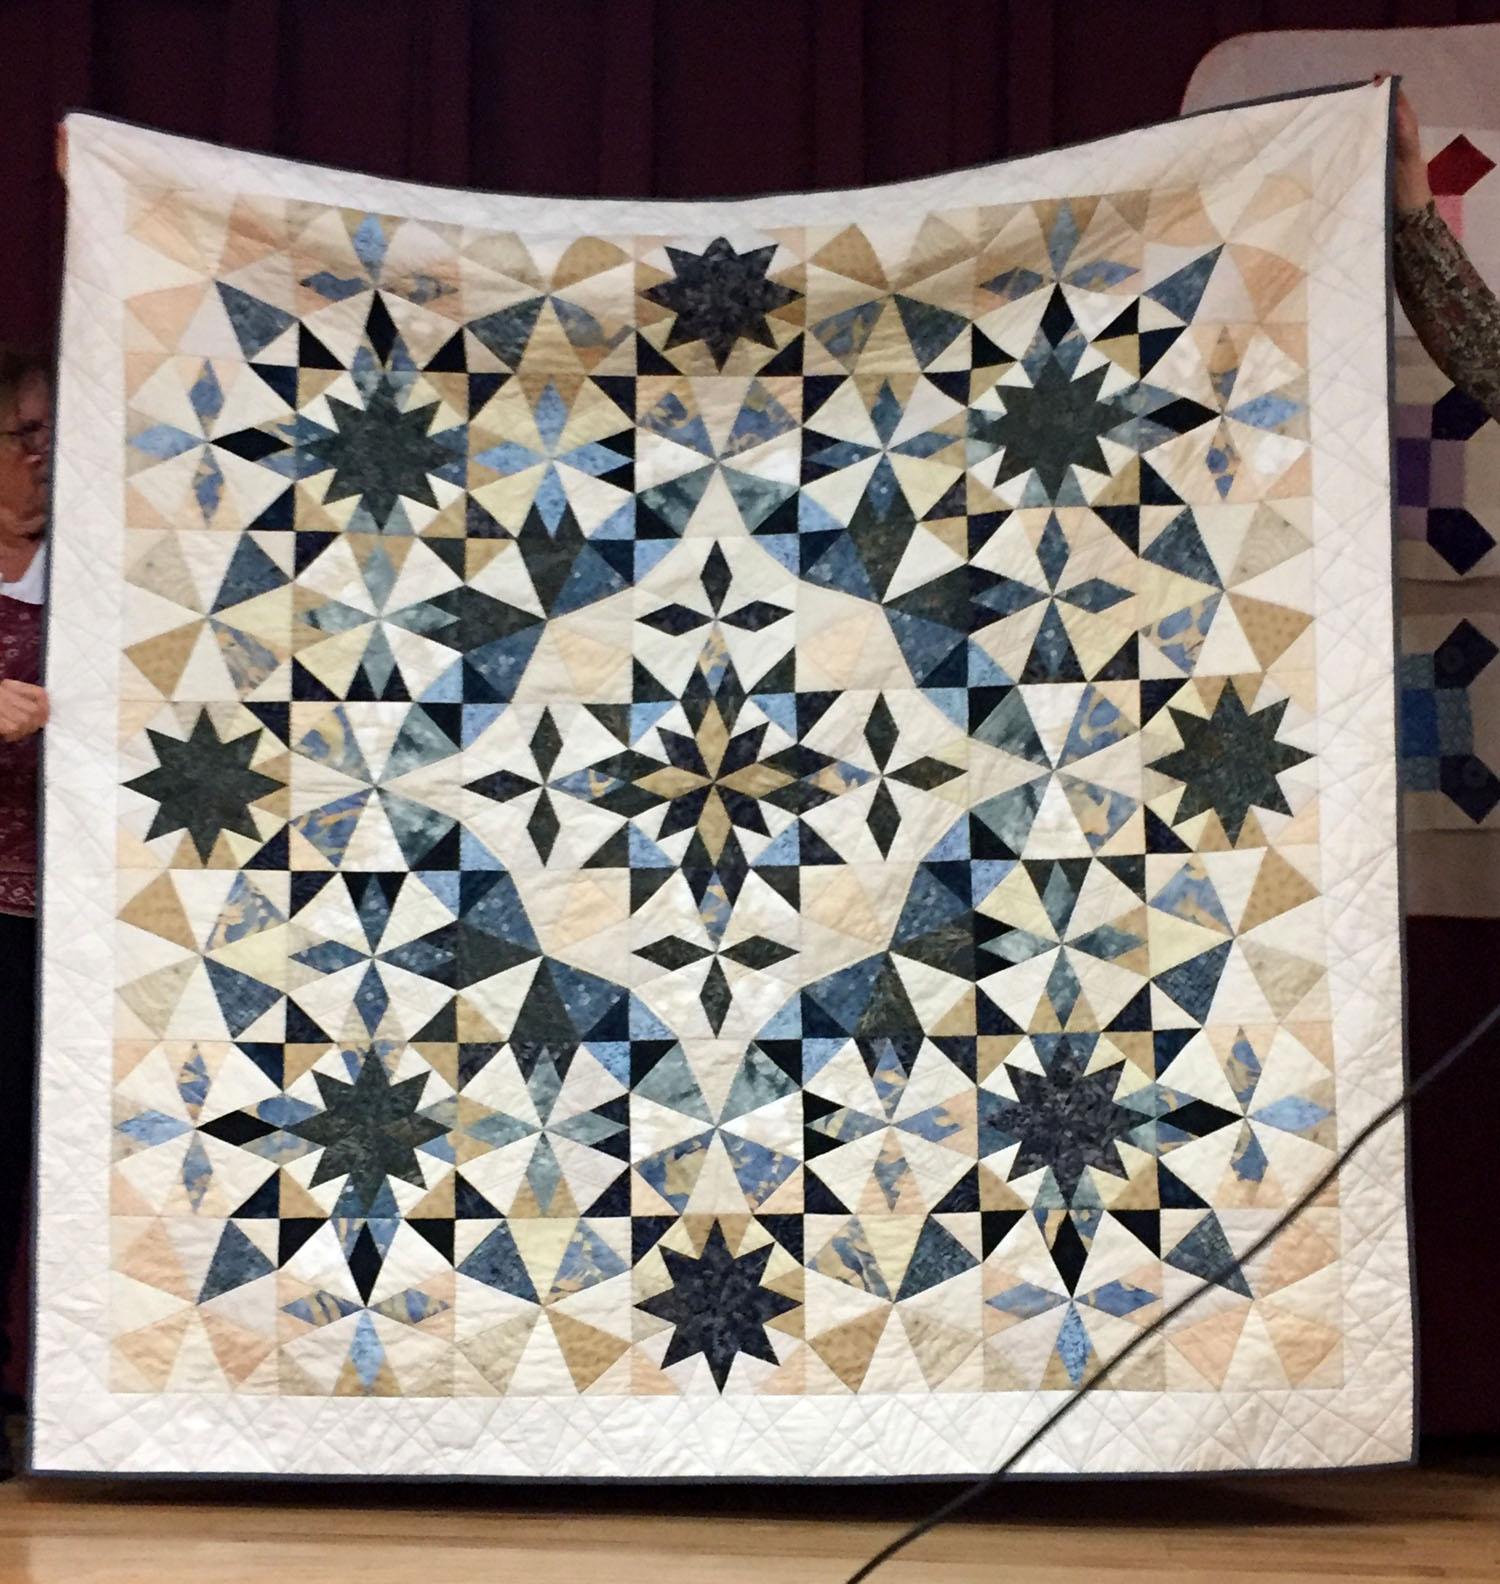 Alaska Quilt by Michael Senstack